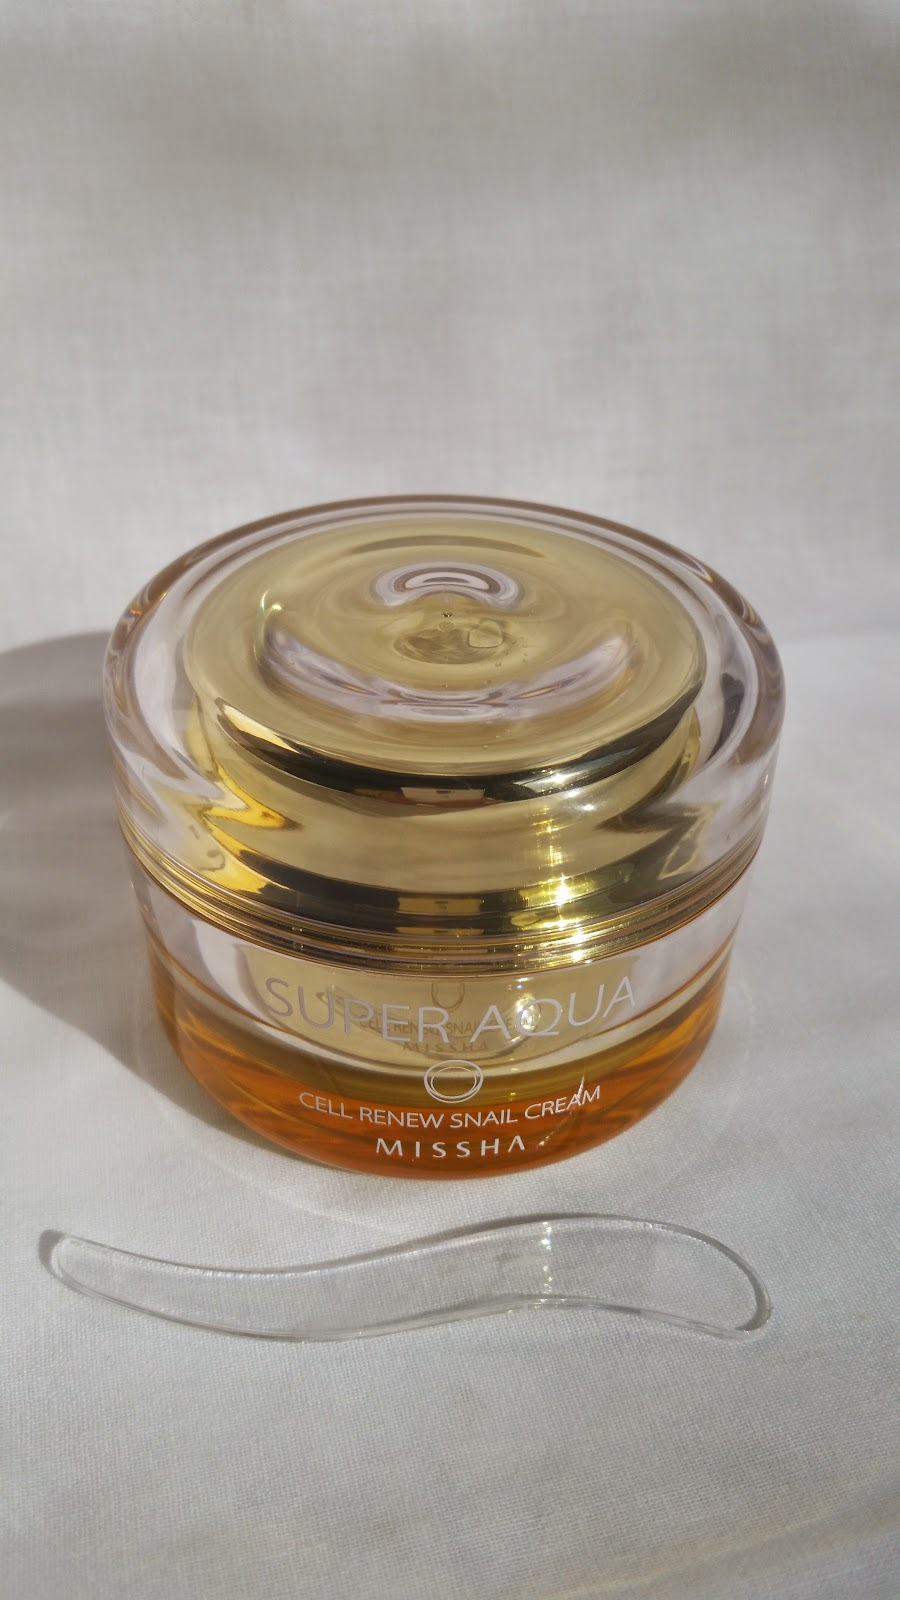 Empties Review: Missha Super Aqua Cell Renew Snail Cream | Holy ...